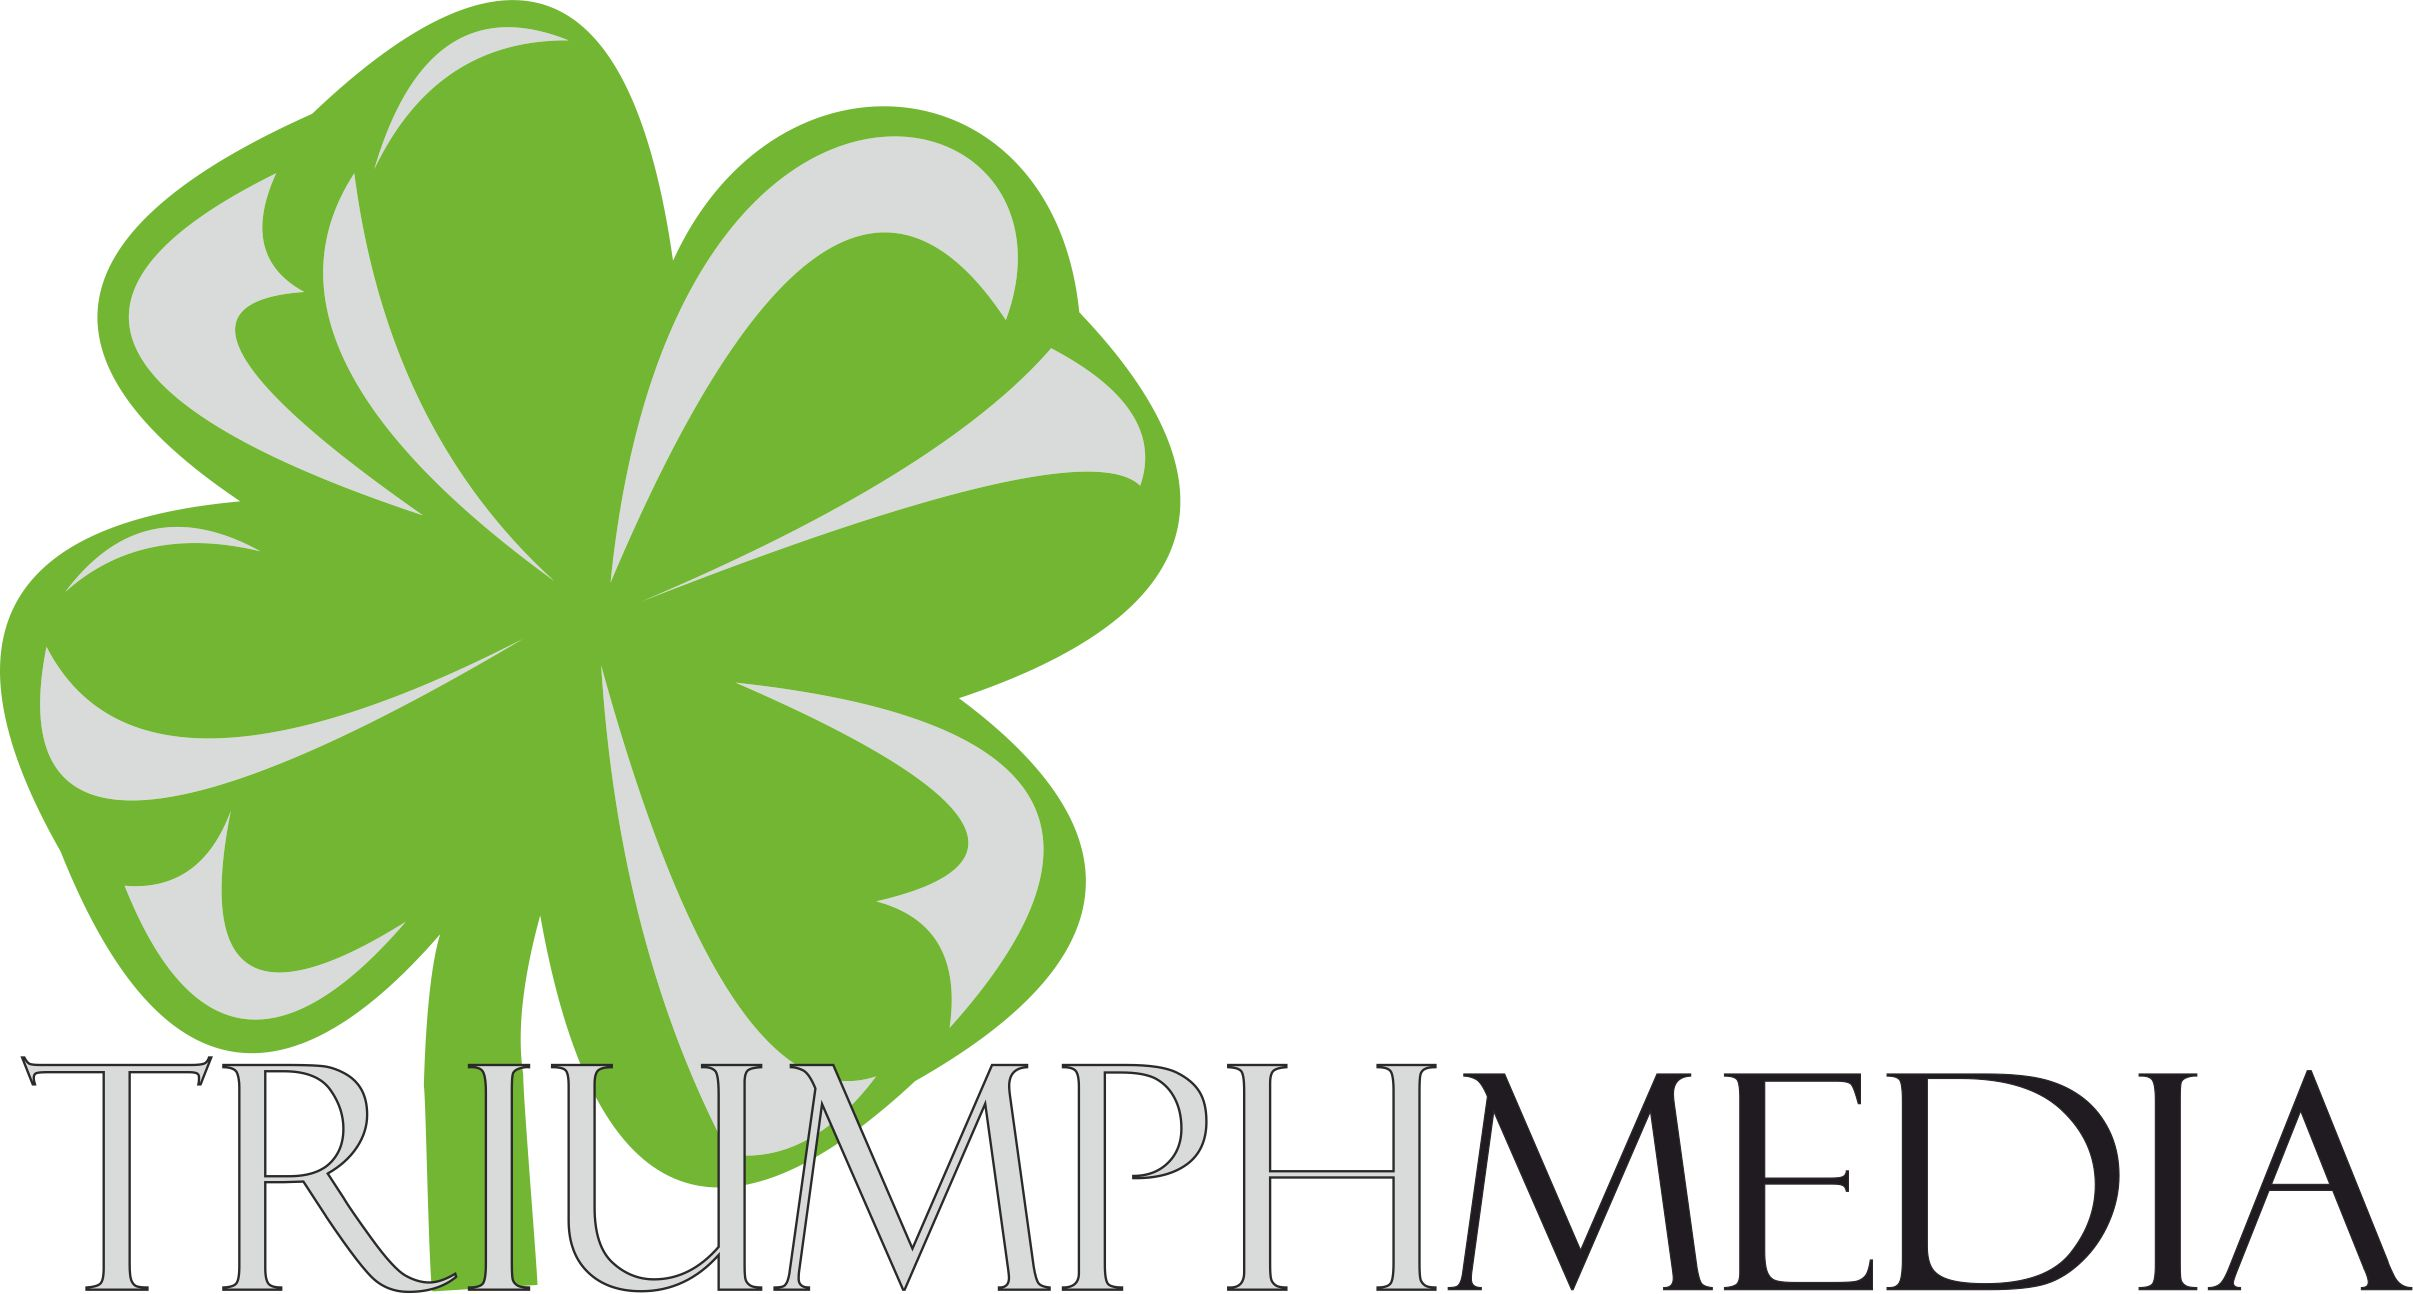 Разработка логотипа  TRIUMPH MEDIA с изображением клевера фото f_506ee82d63a28.jpg